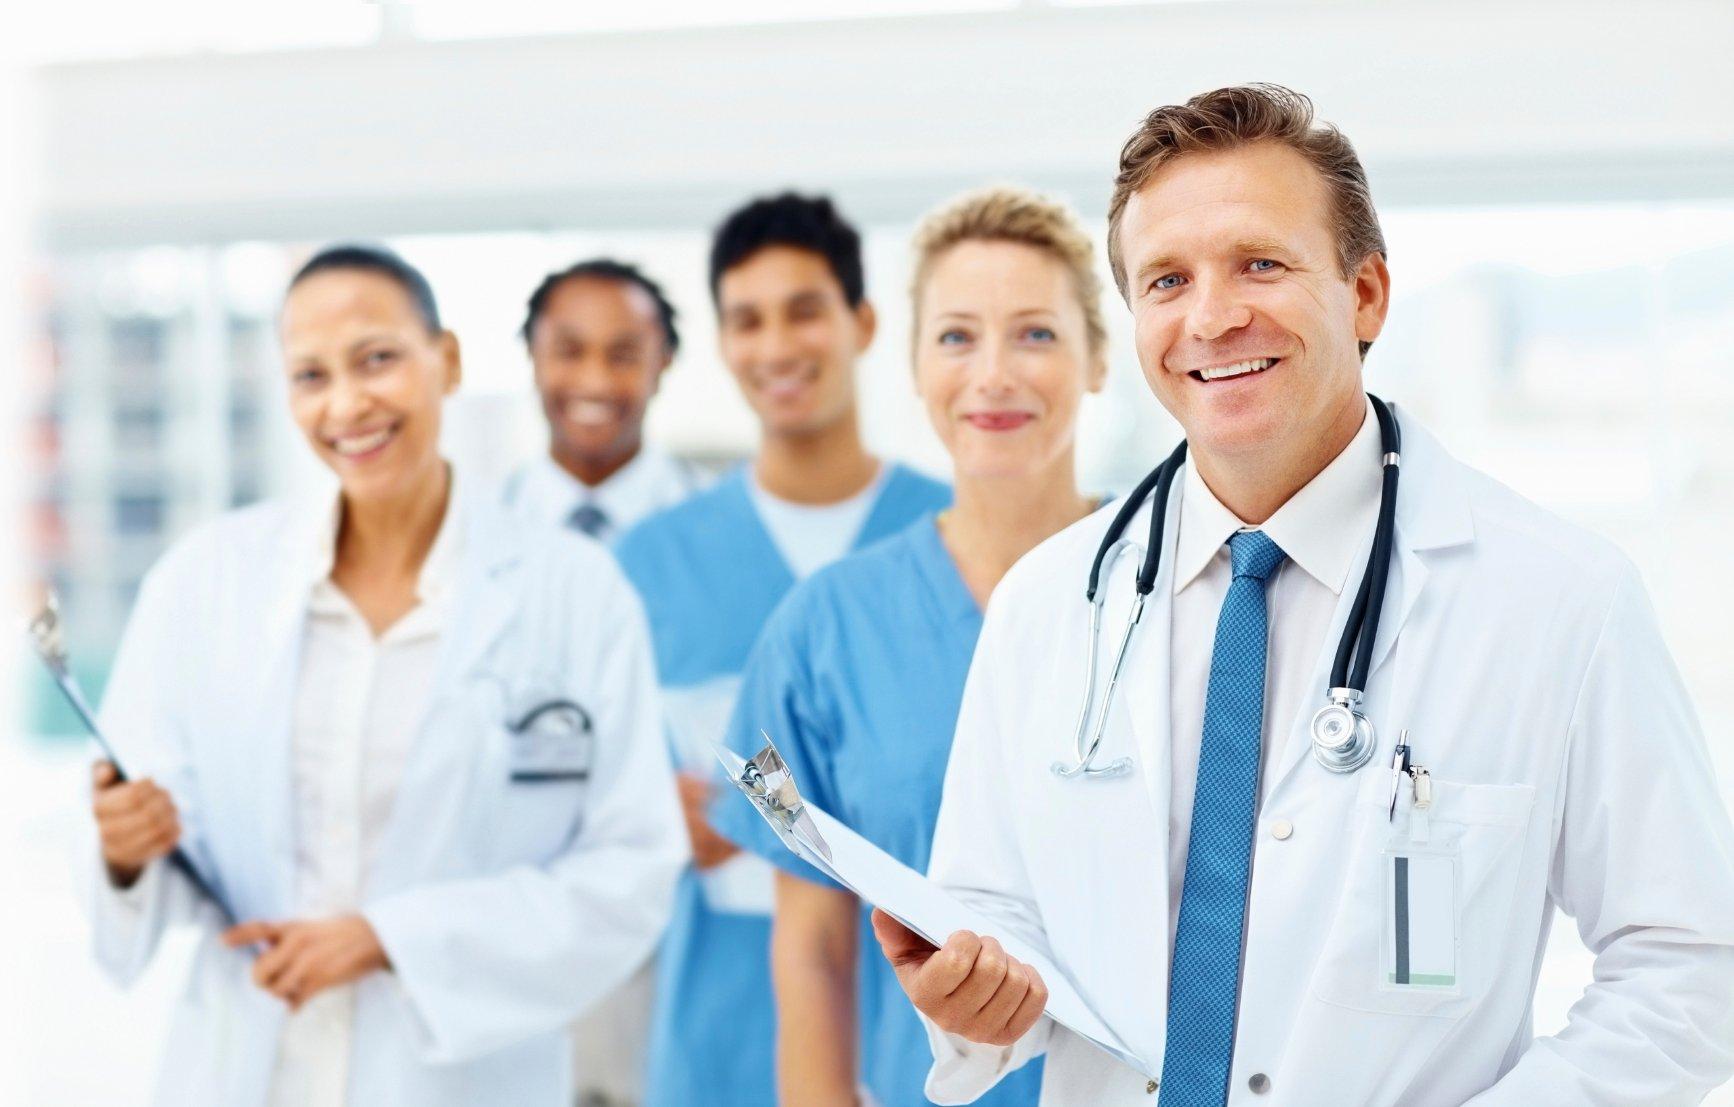 free dating websites for medical professionals